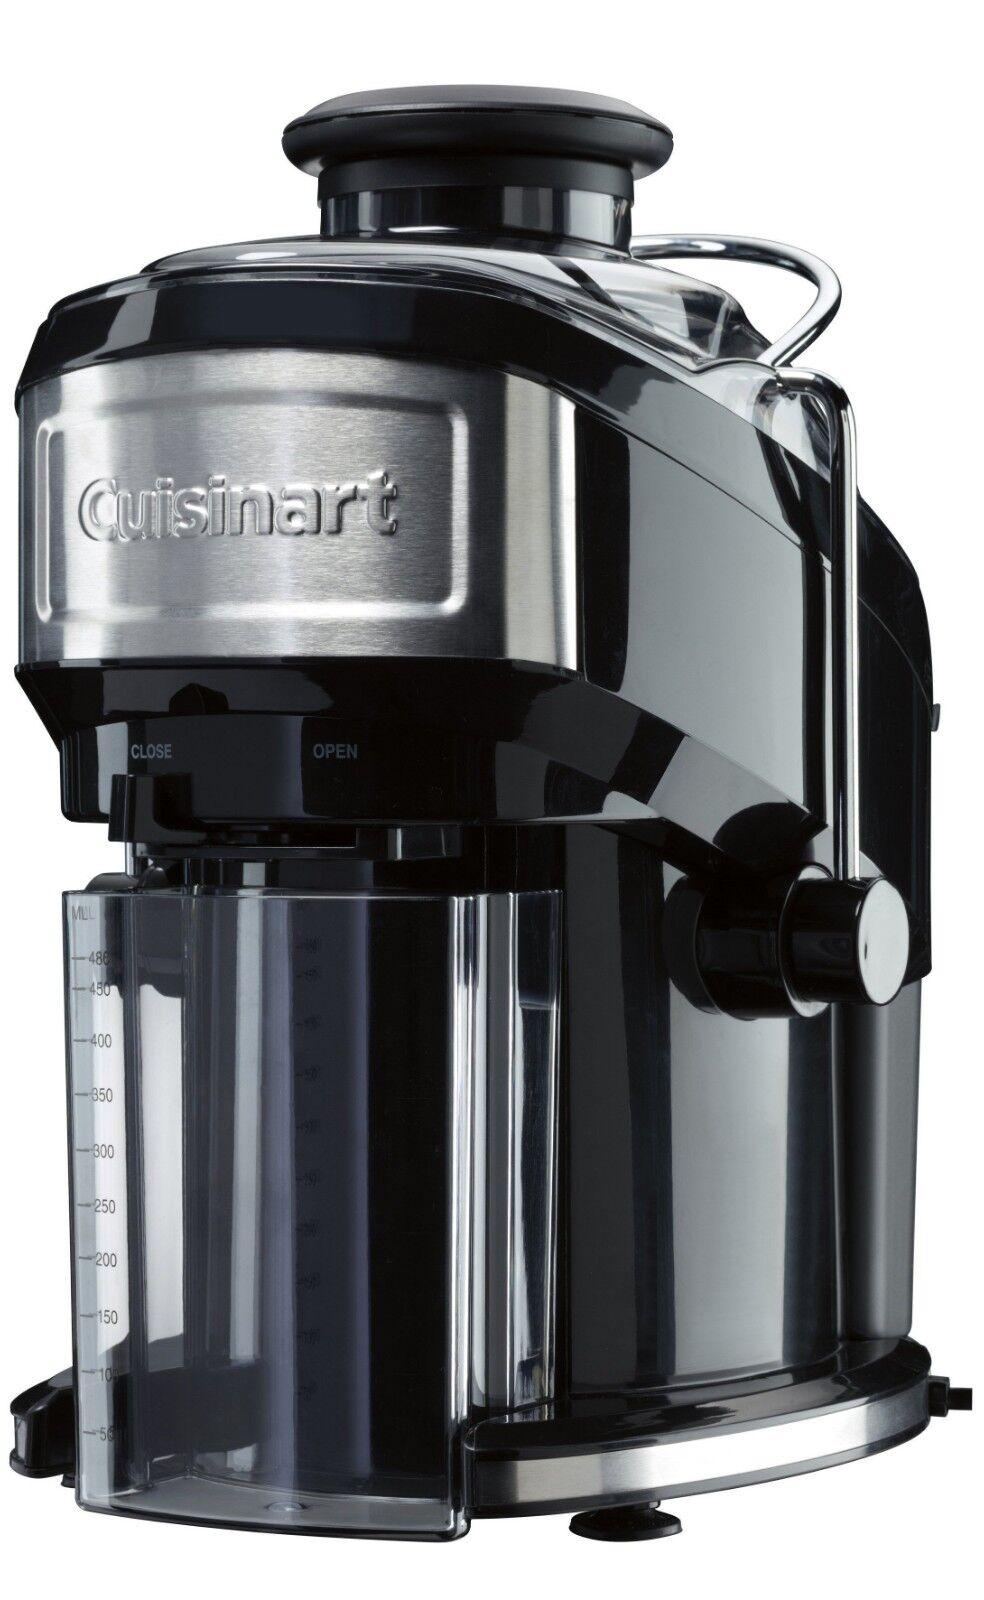 Cuisinart CJE500E Centrifugeuse compacte, Noire   Acier brossé